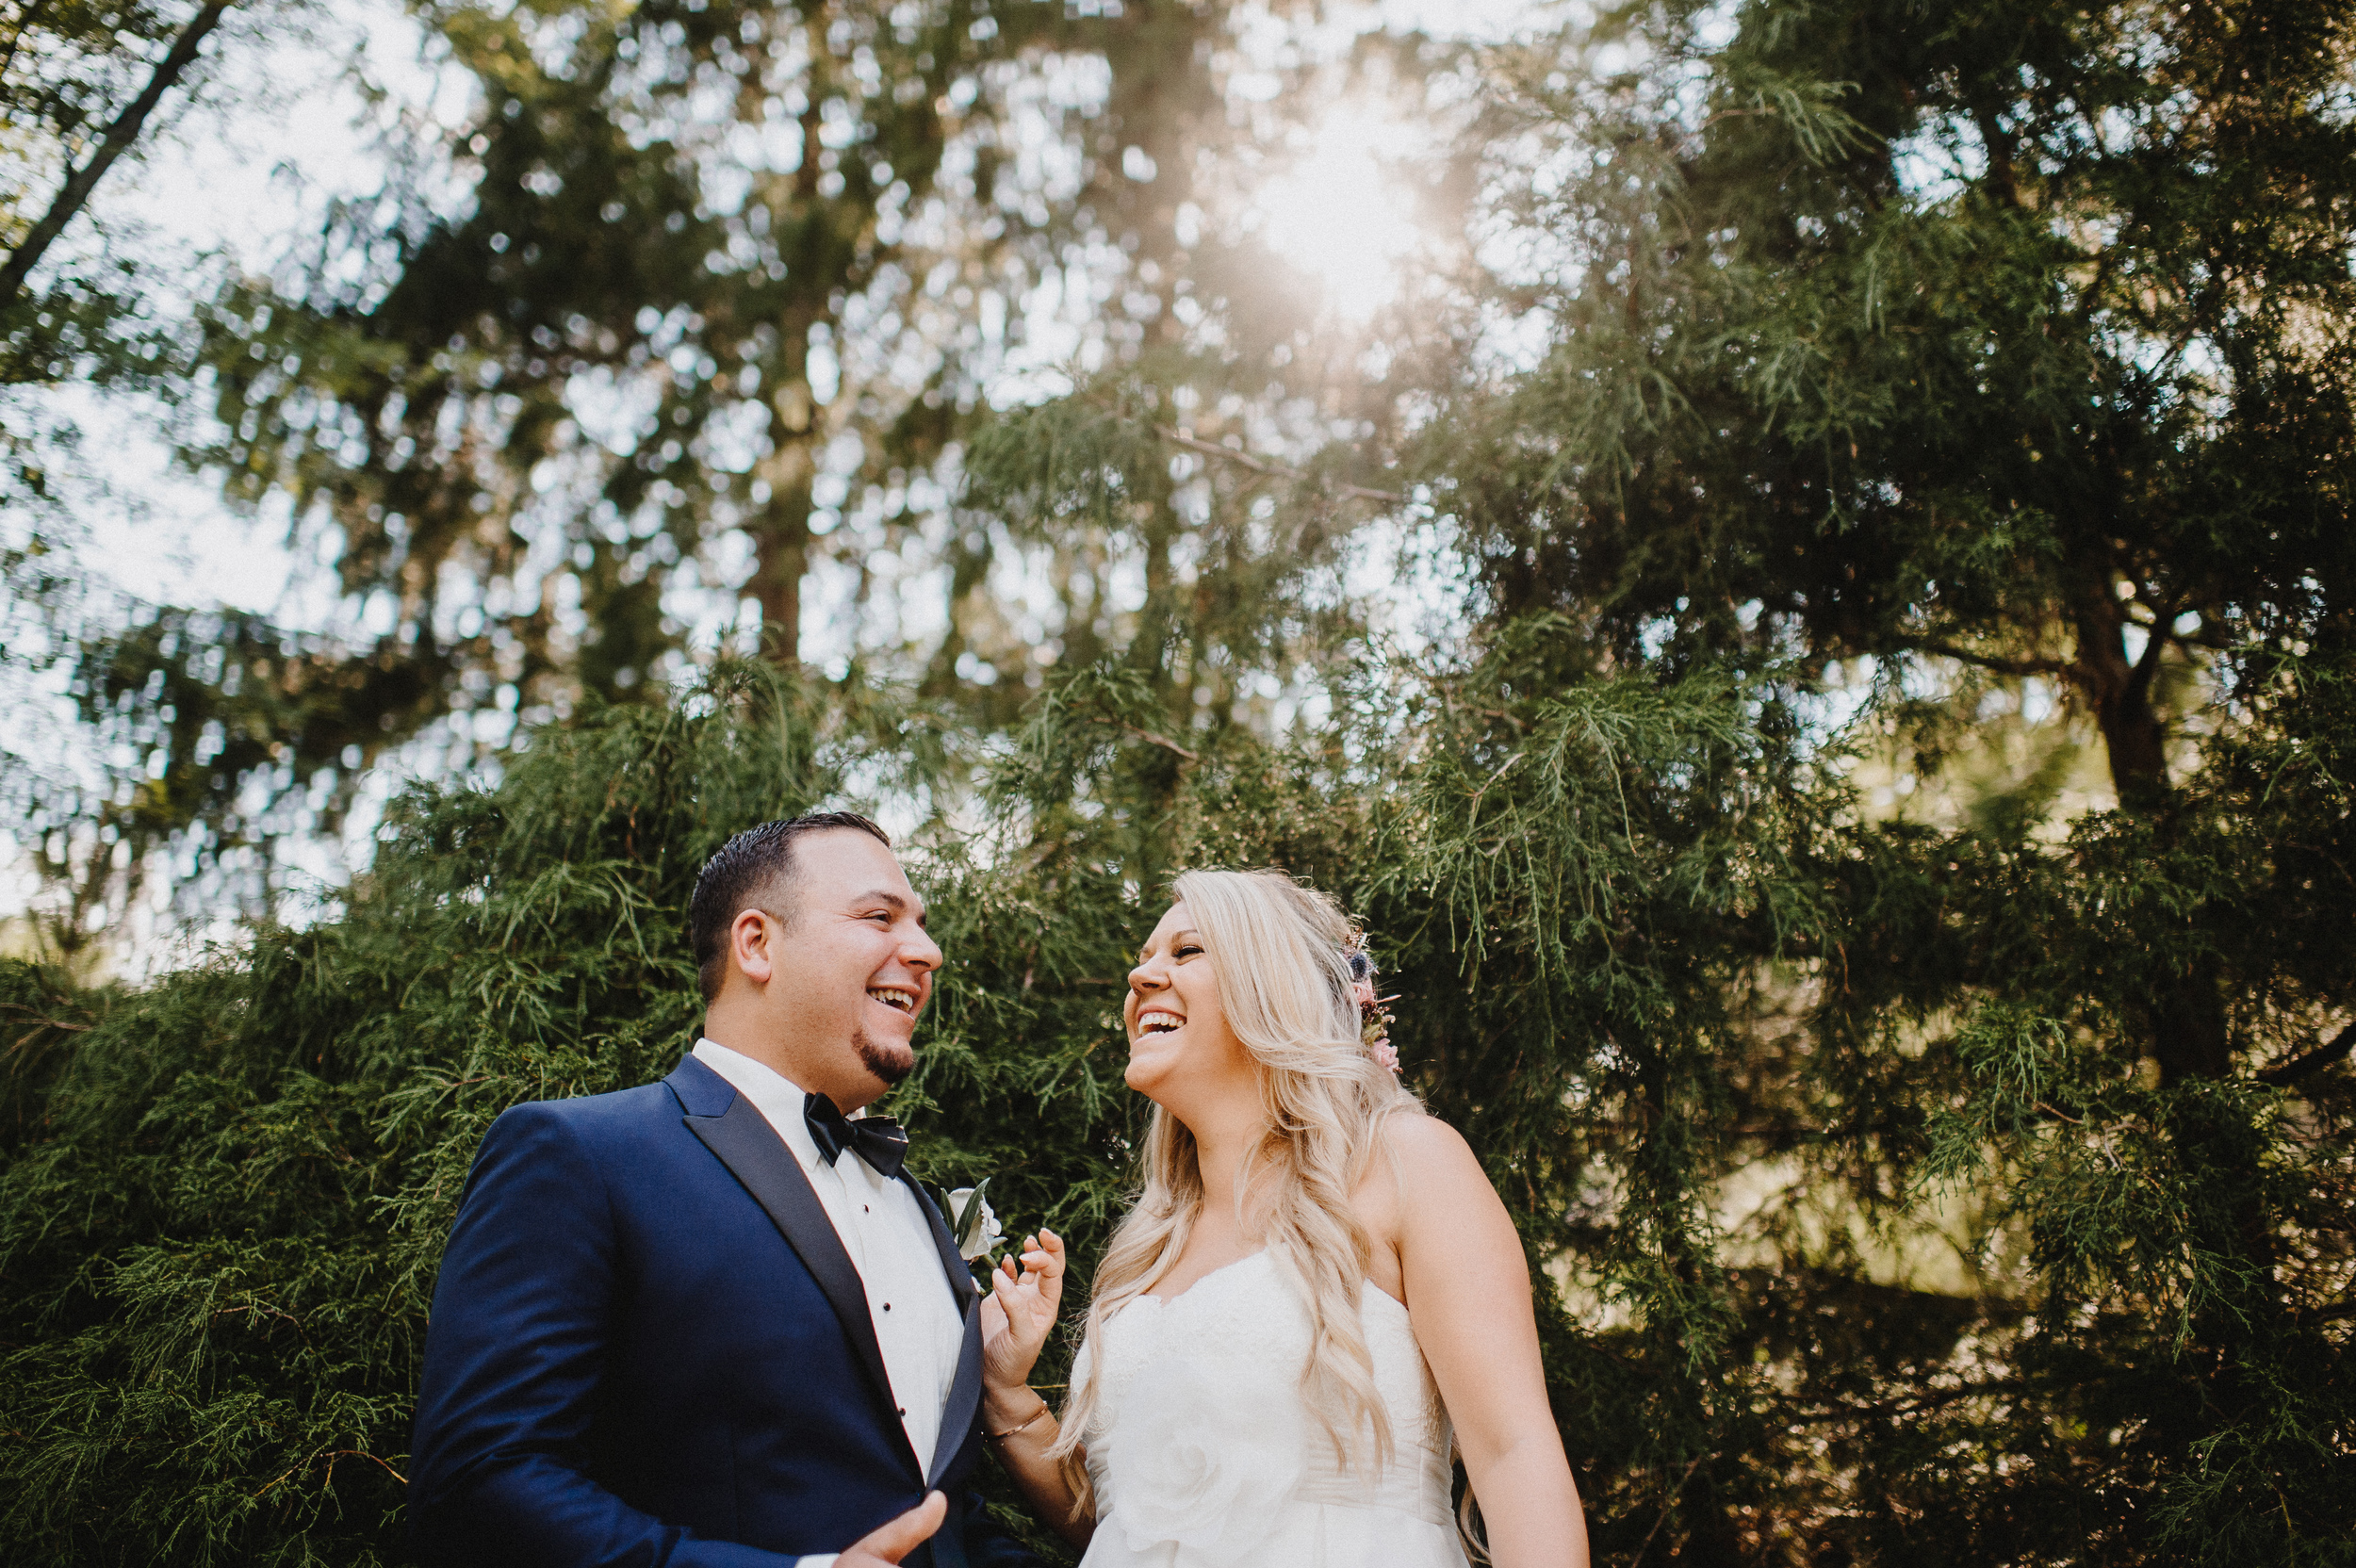 holly-hedge-estate-wedding-photographer-pat-robinson-photography-44.jpg